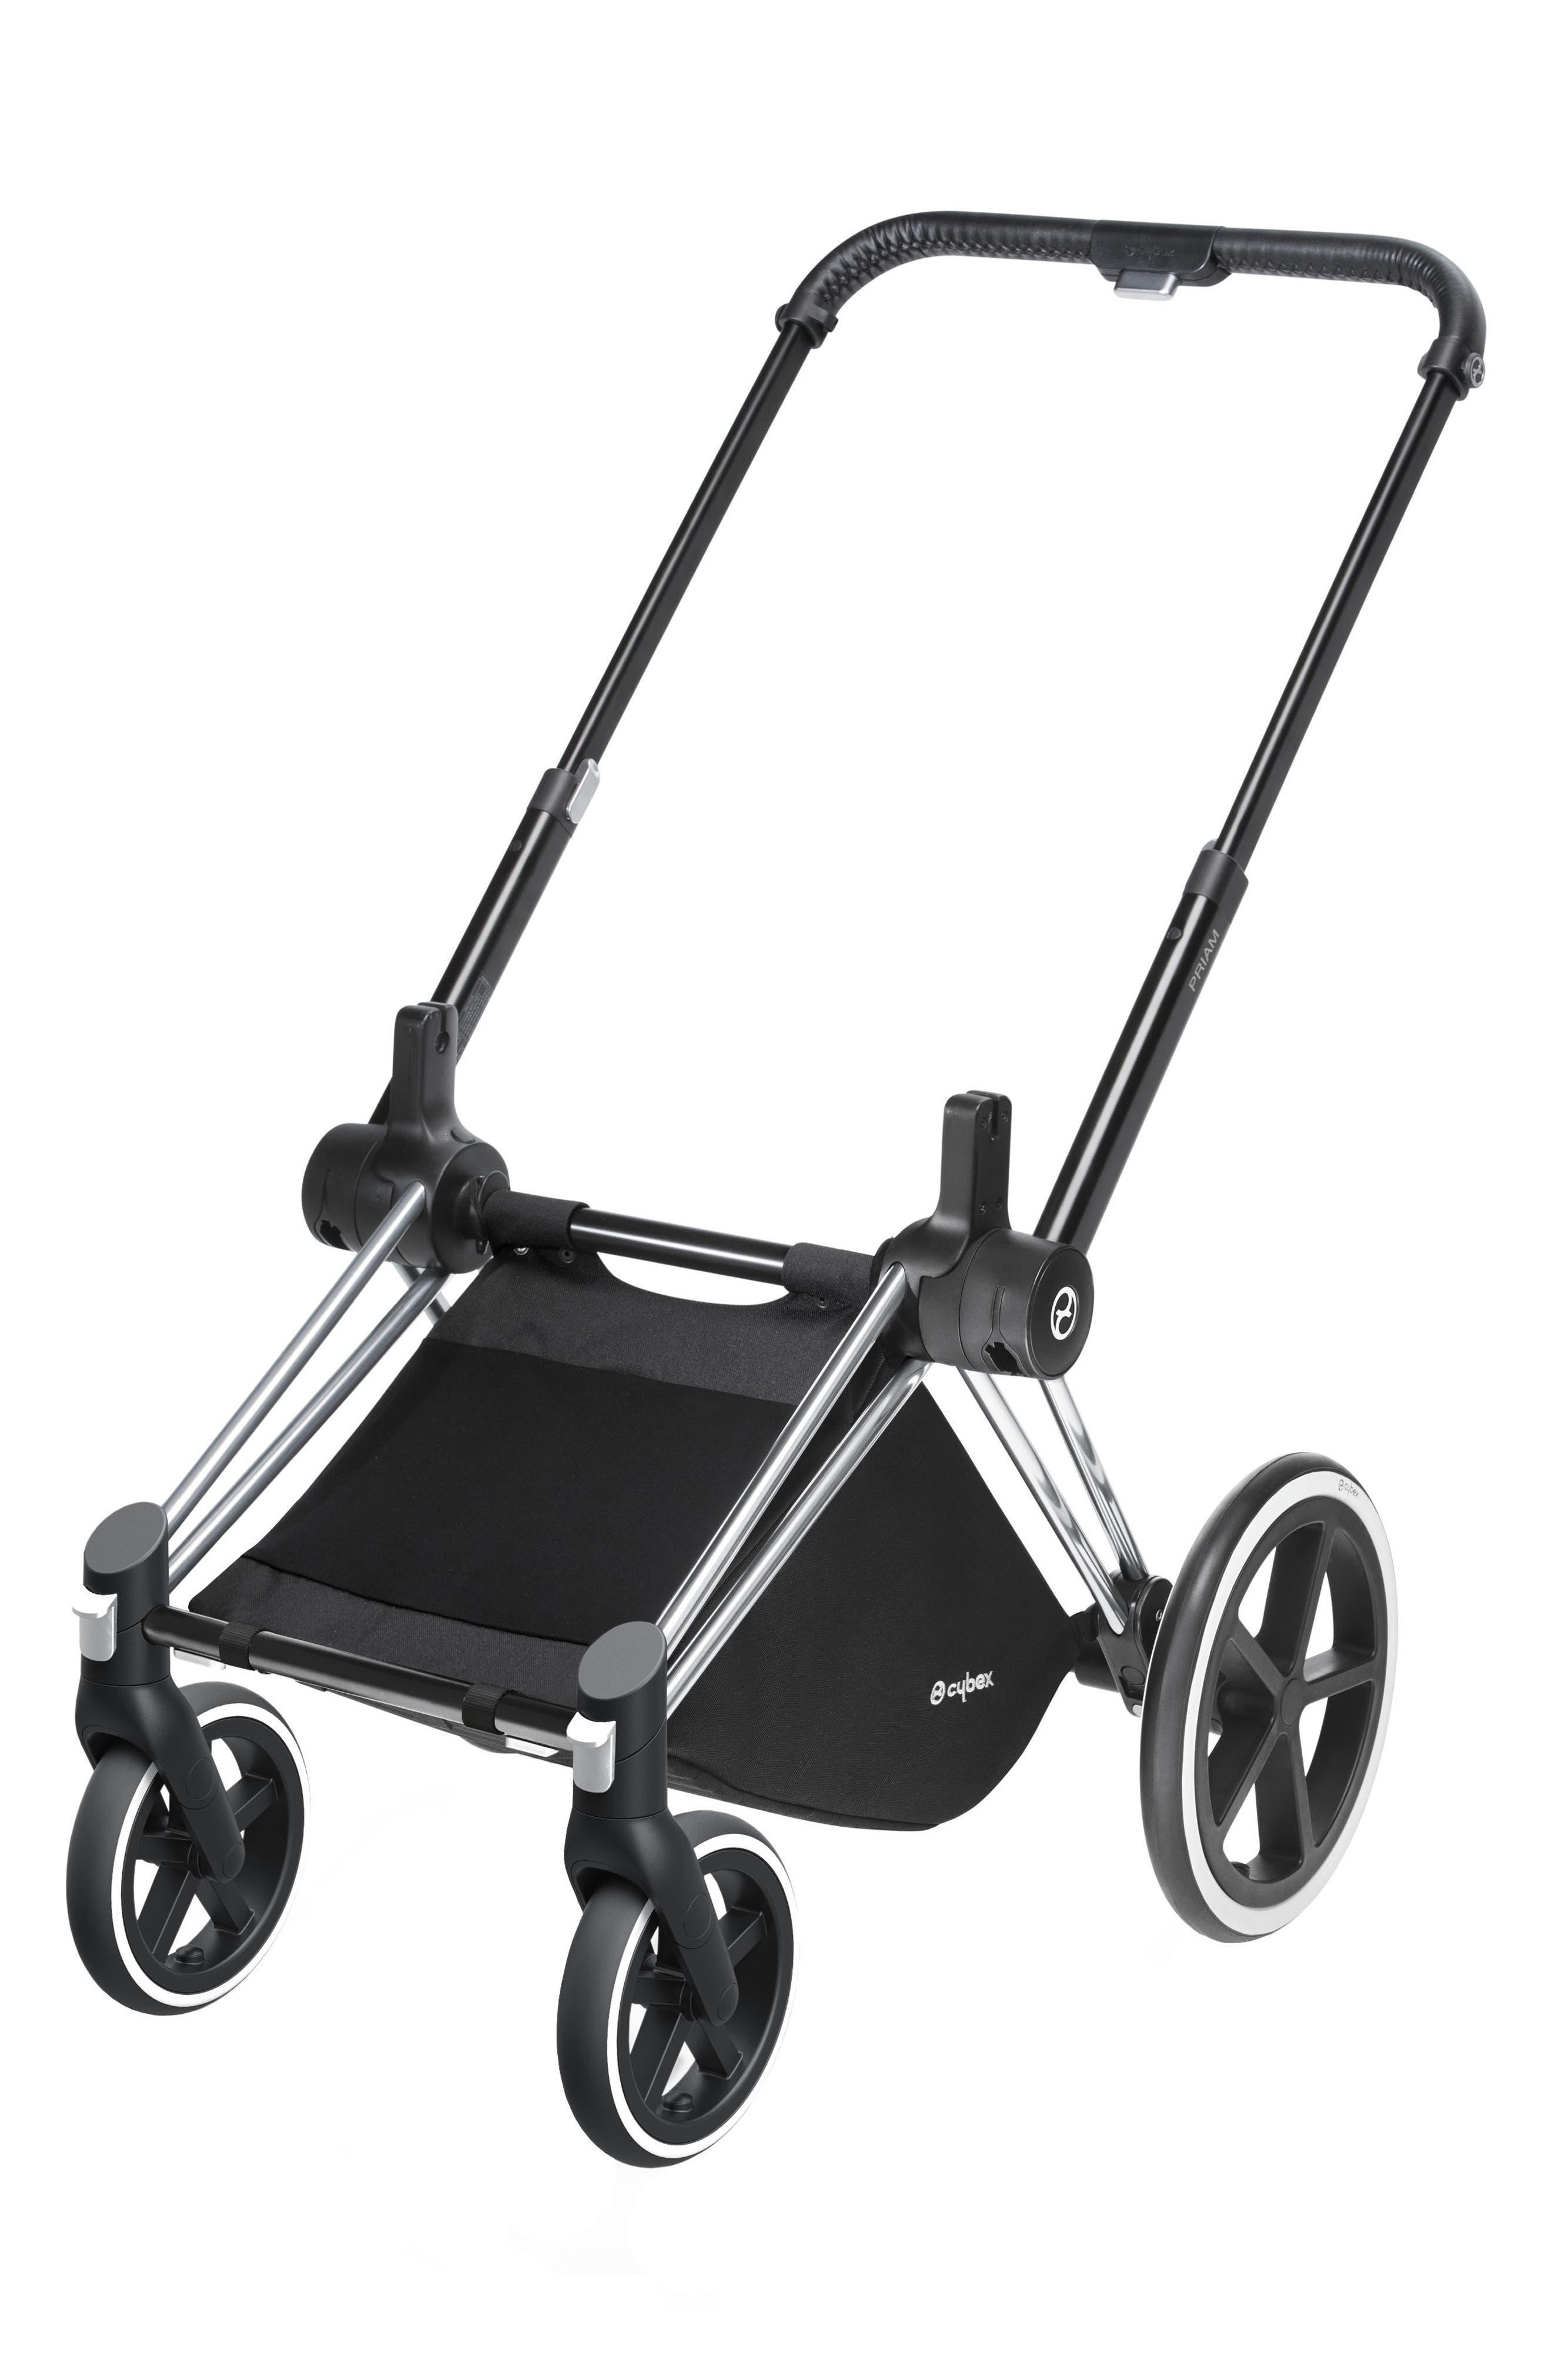 Alternate Image 1 Selected - CYBEX Priam Stroller Frame with Trekking Wheels